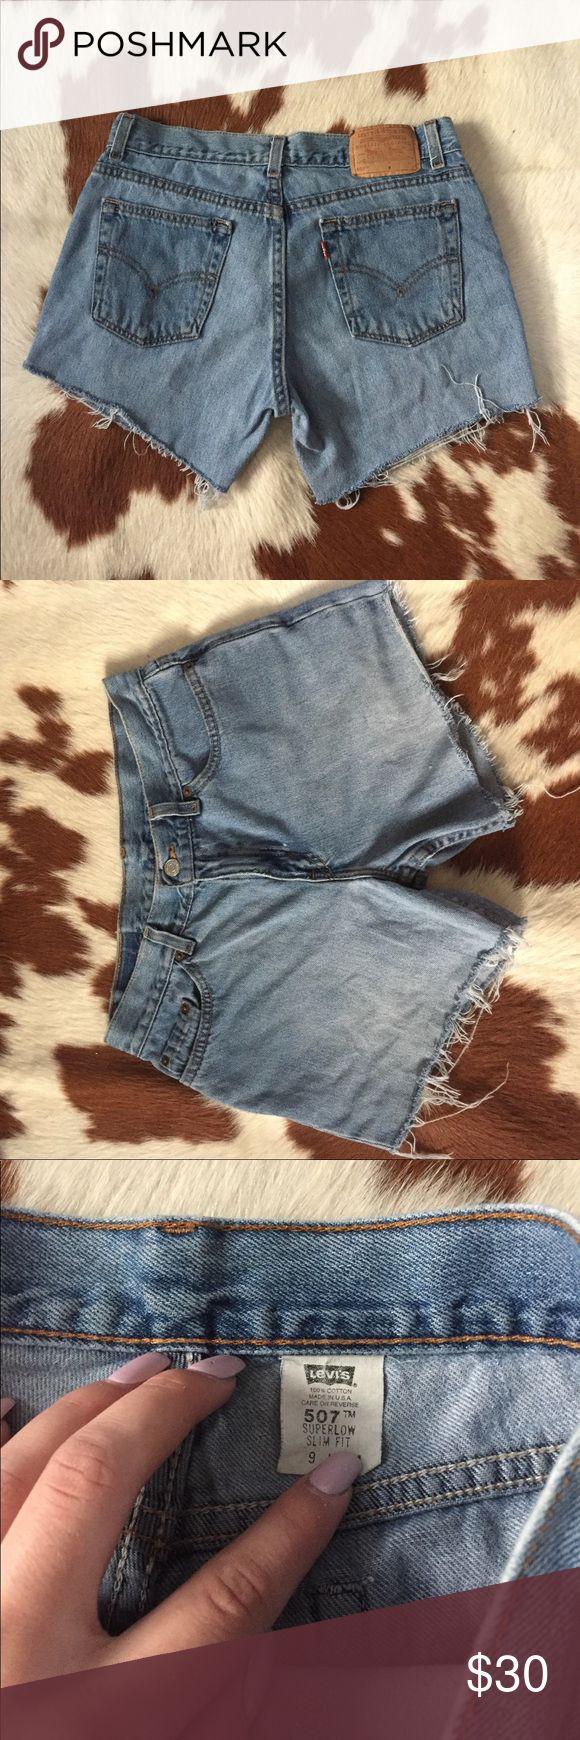 Levi's 507 Shorts 30 inch high waist. 9 inch rise. 4.5 inch inseam Levi's Shorts Jean Shorts